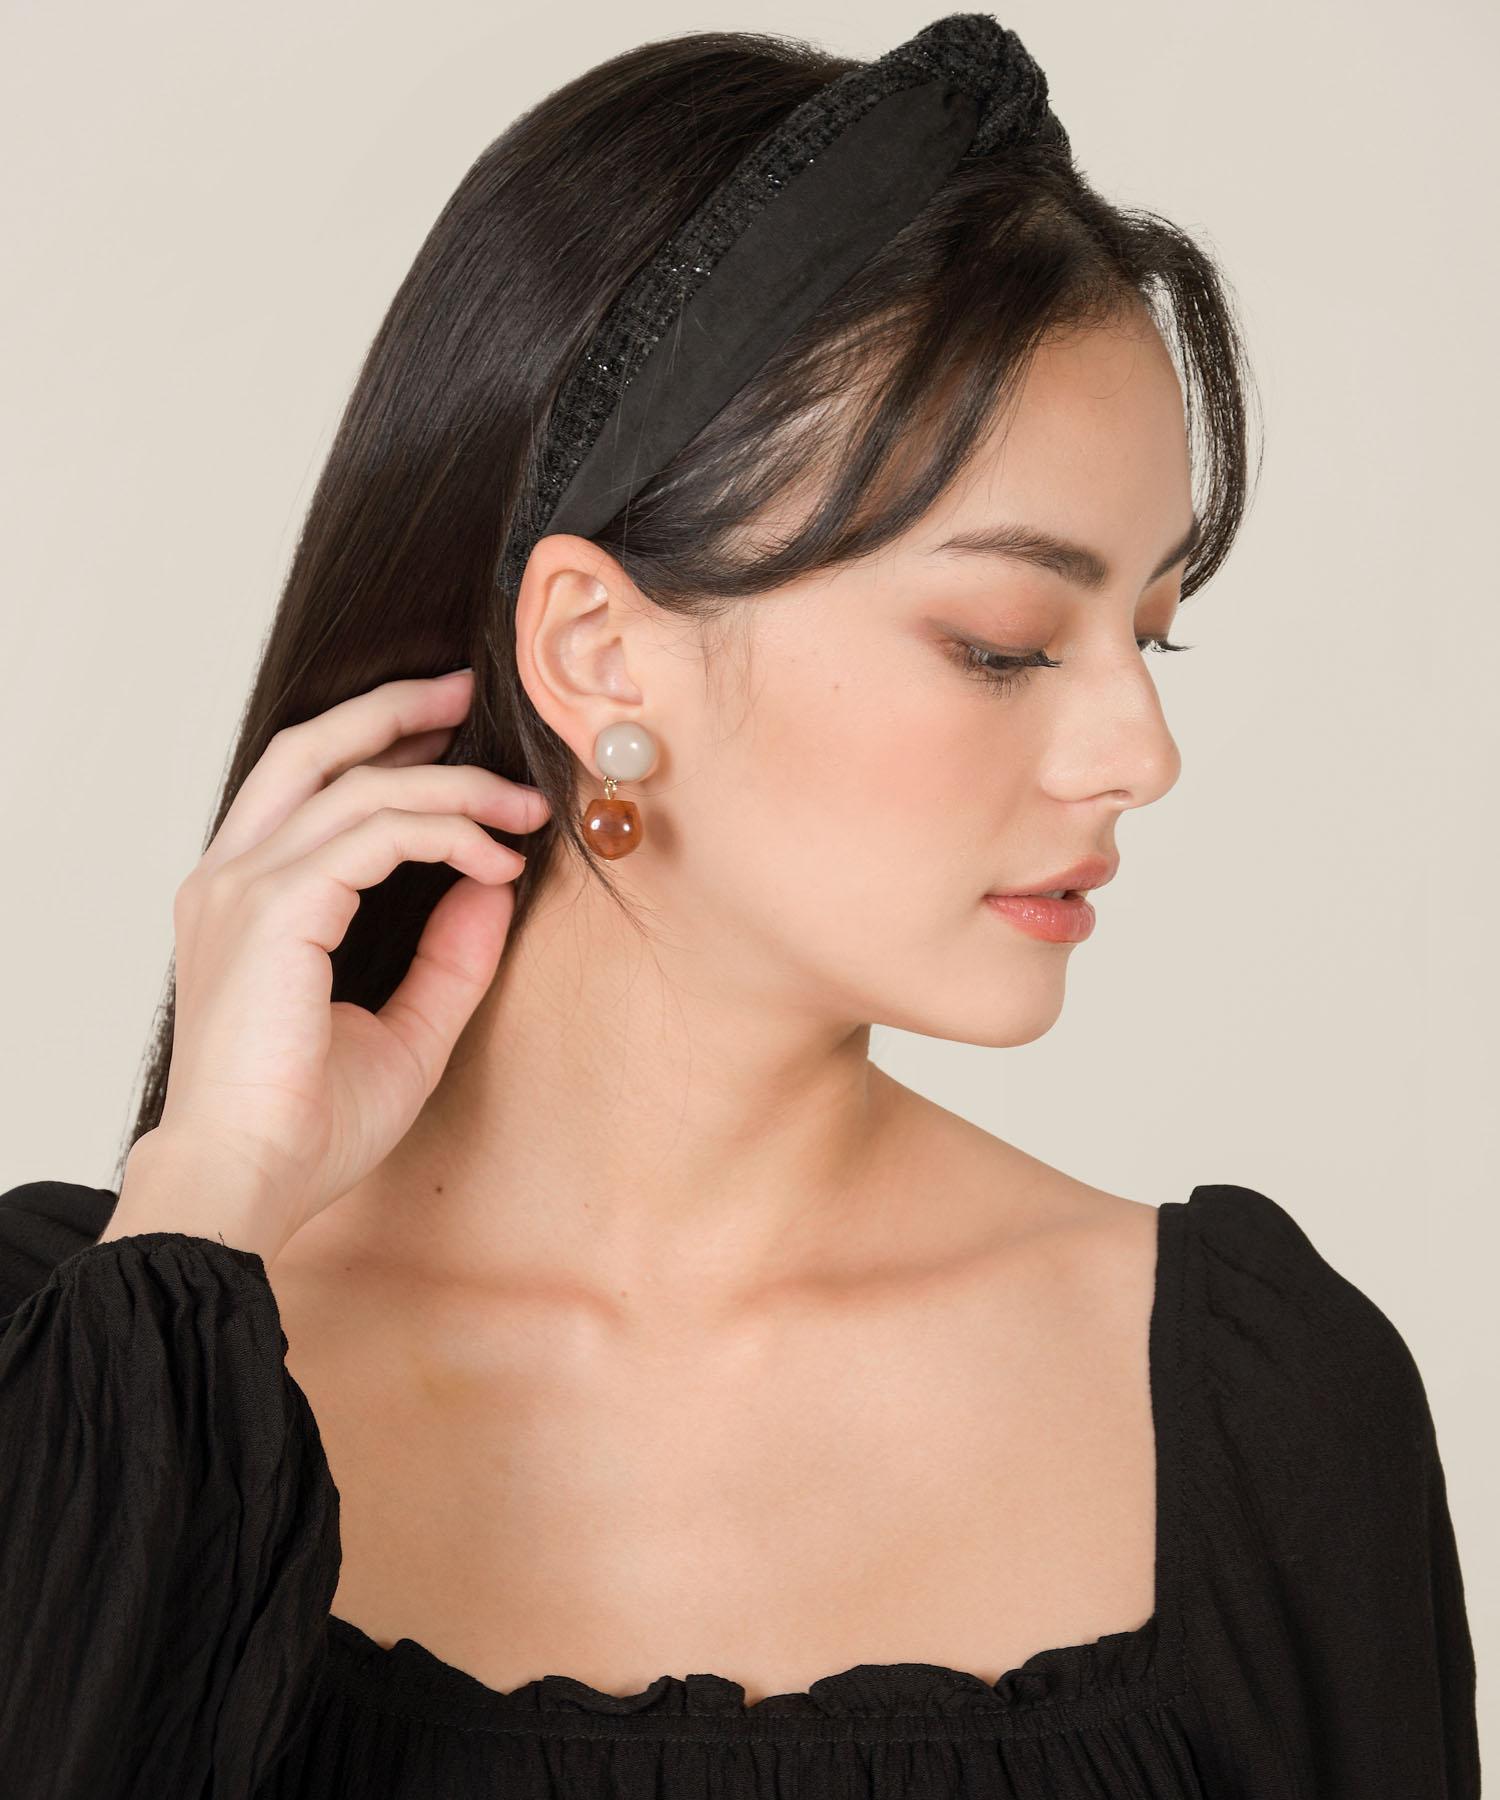 almany-tweed-knot-headband-black-1